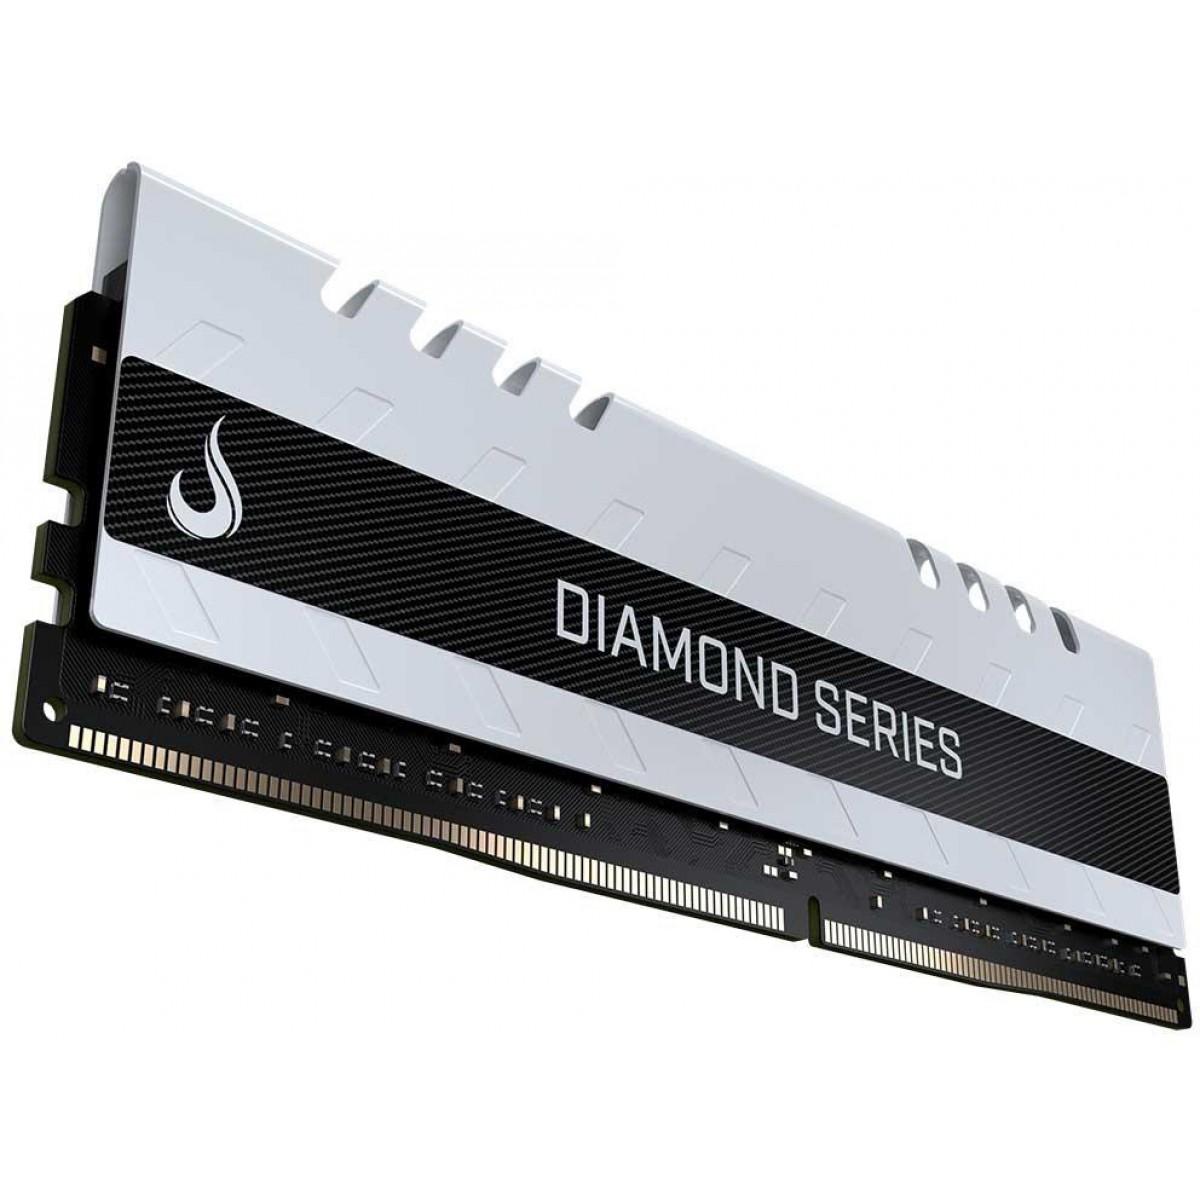 Memória DDR4 Rise Mode Diamond Series, 4GB, 3000MHz, White, RM-D4-4GB-3000DW